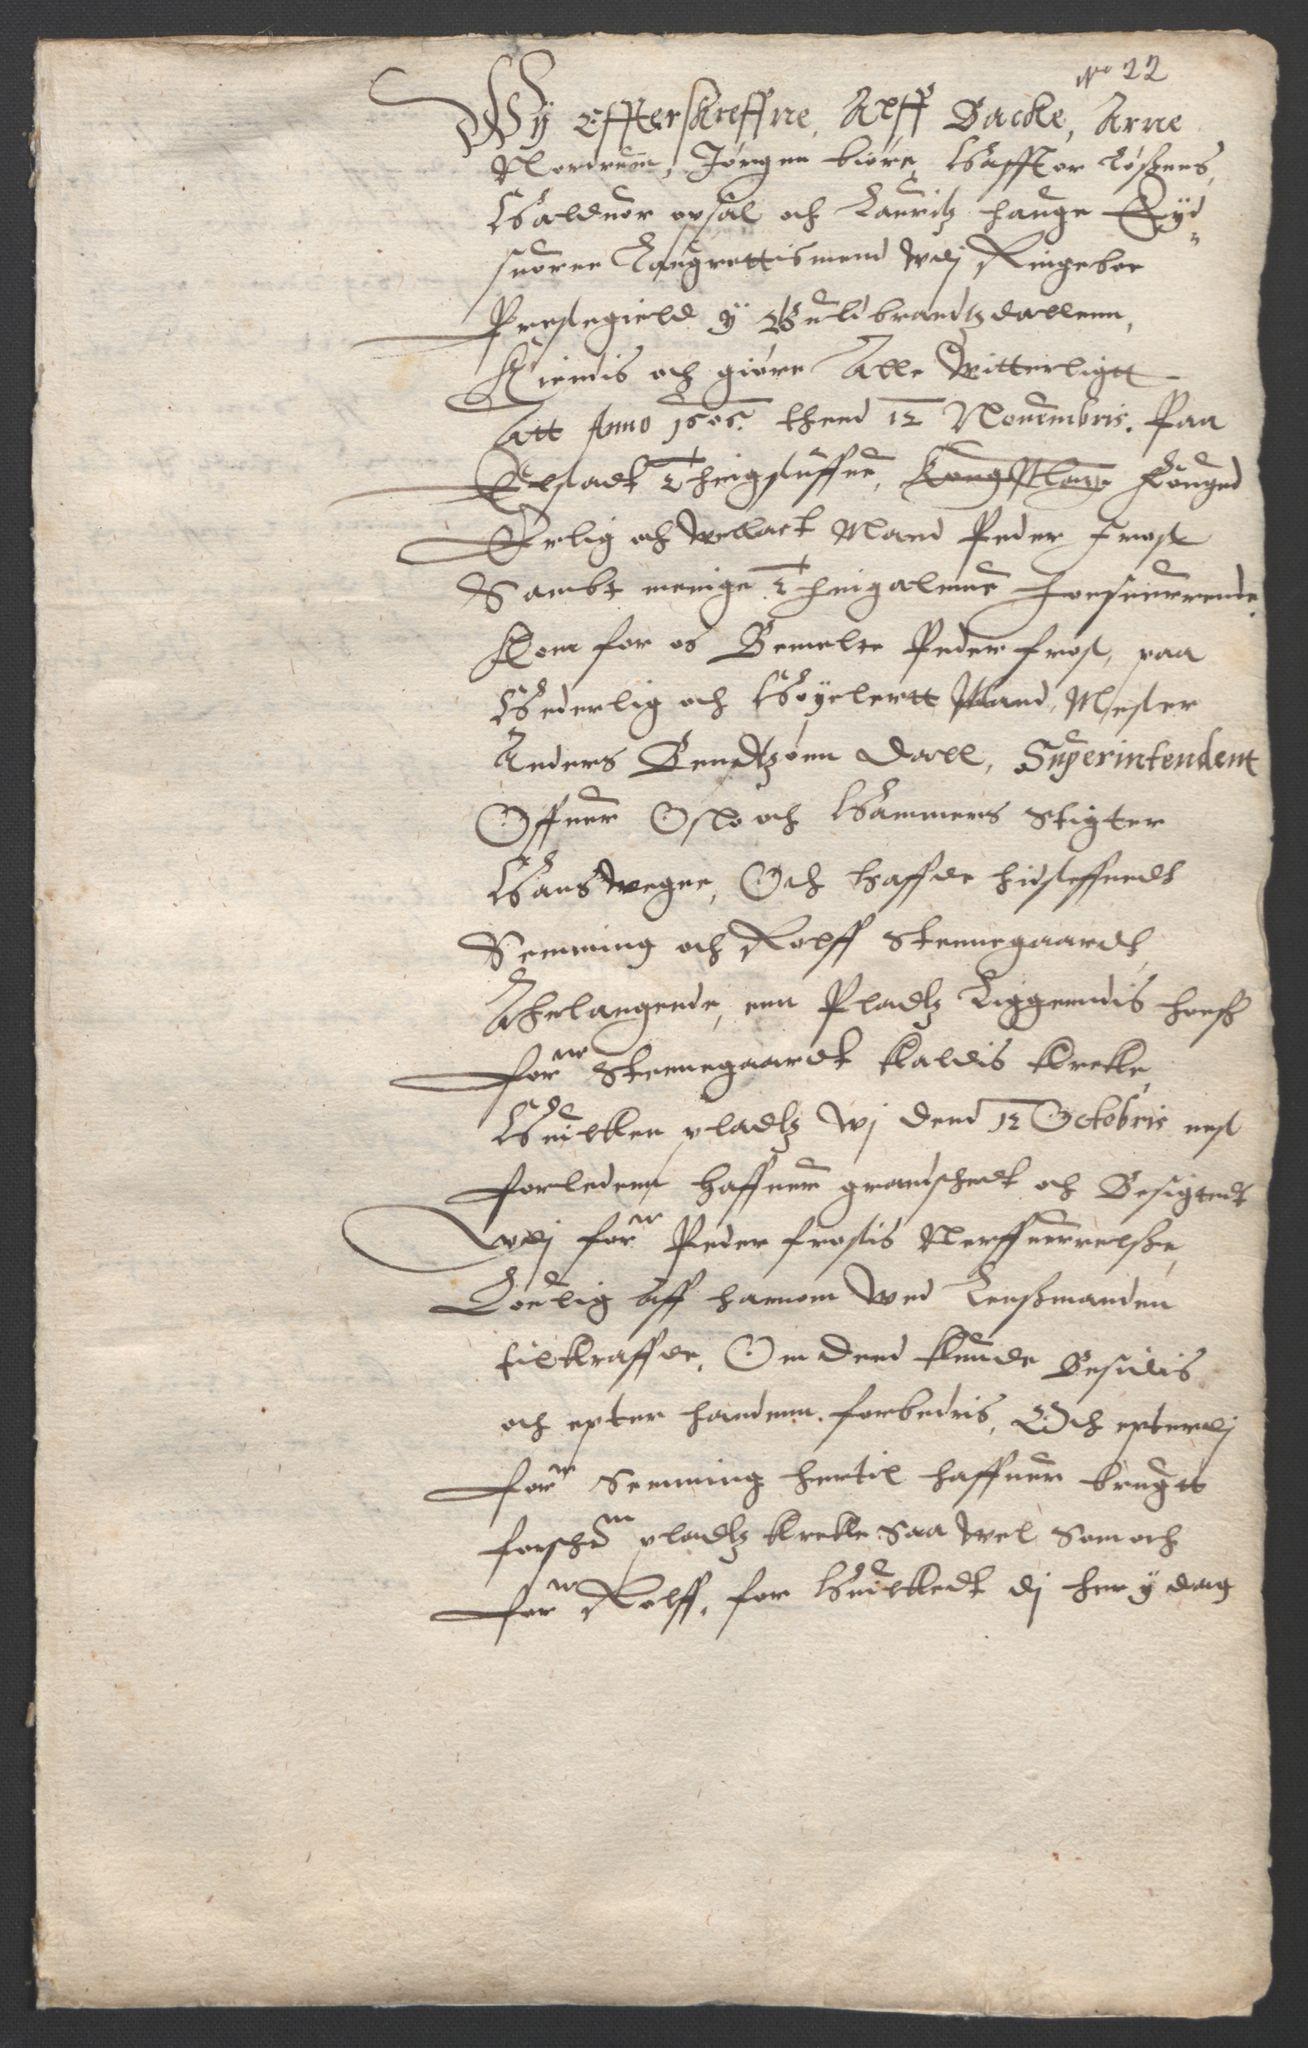 SAO, Oslo stiftsdireksjon, G/Gb/L0001: Bispestolens dokumenter, 1584-1612, s. 22